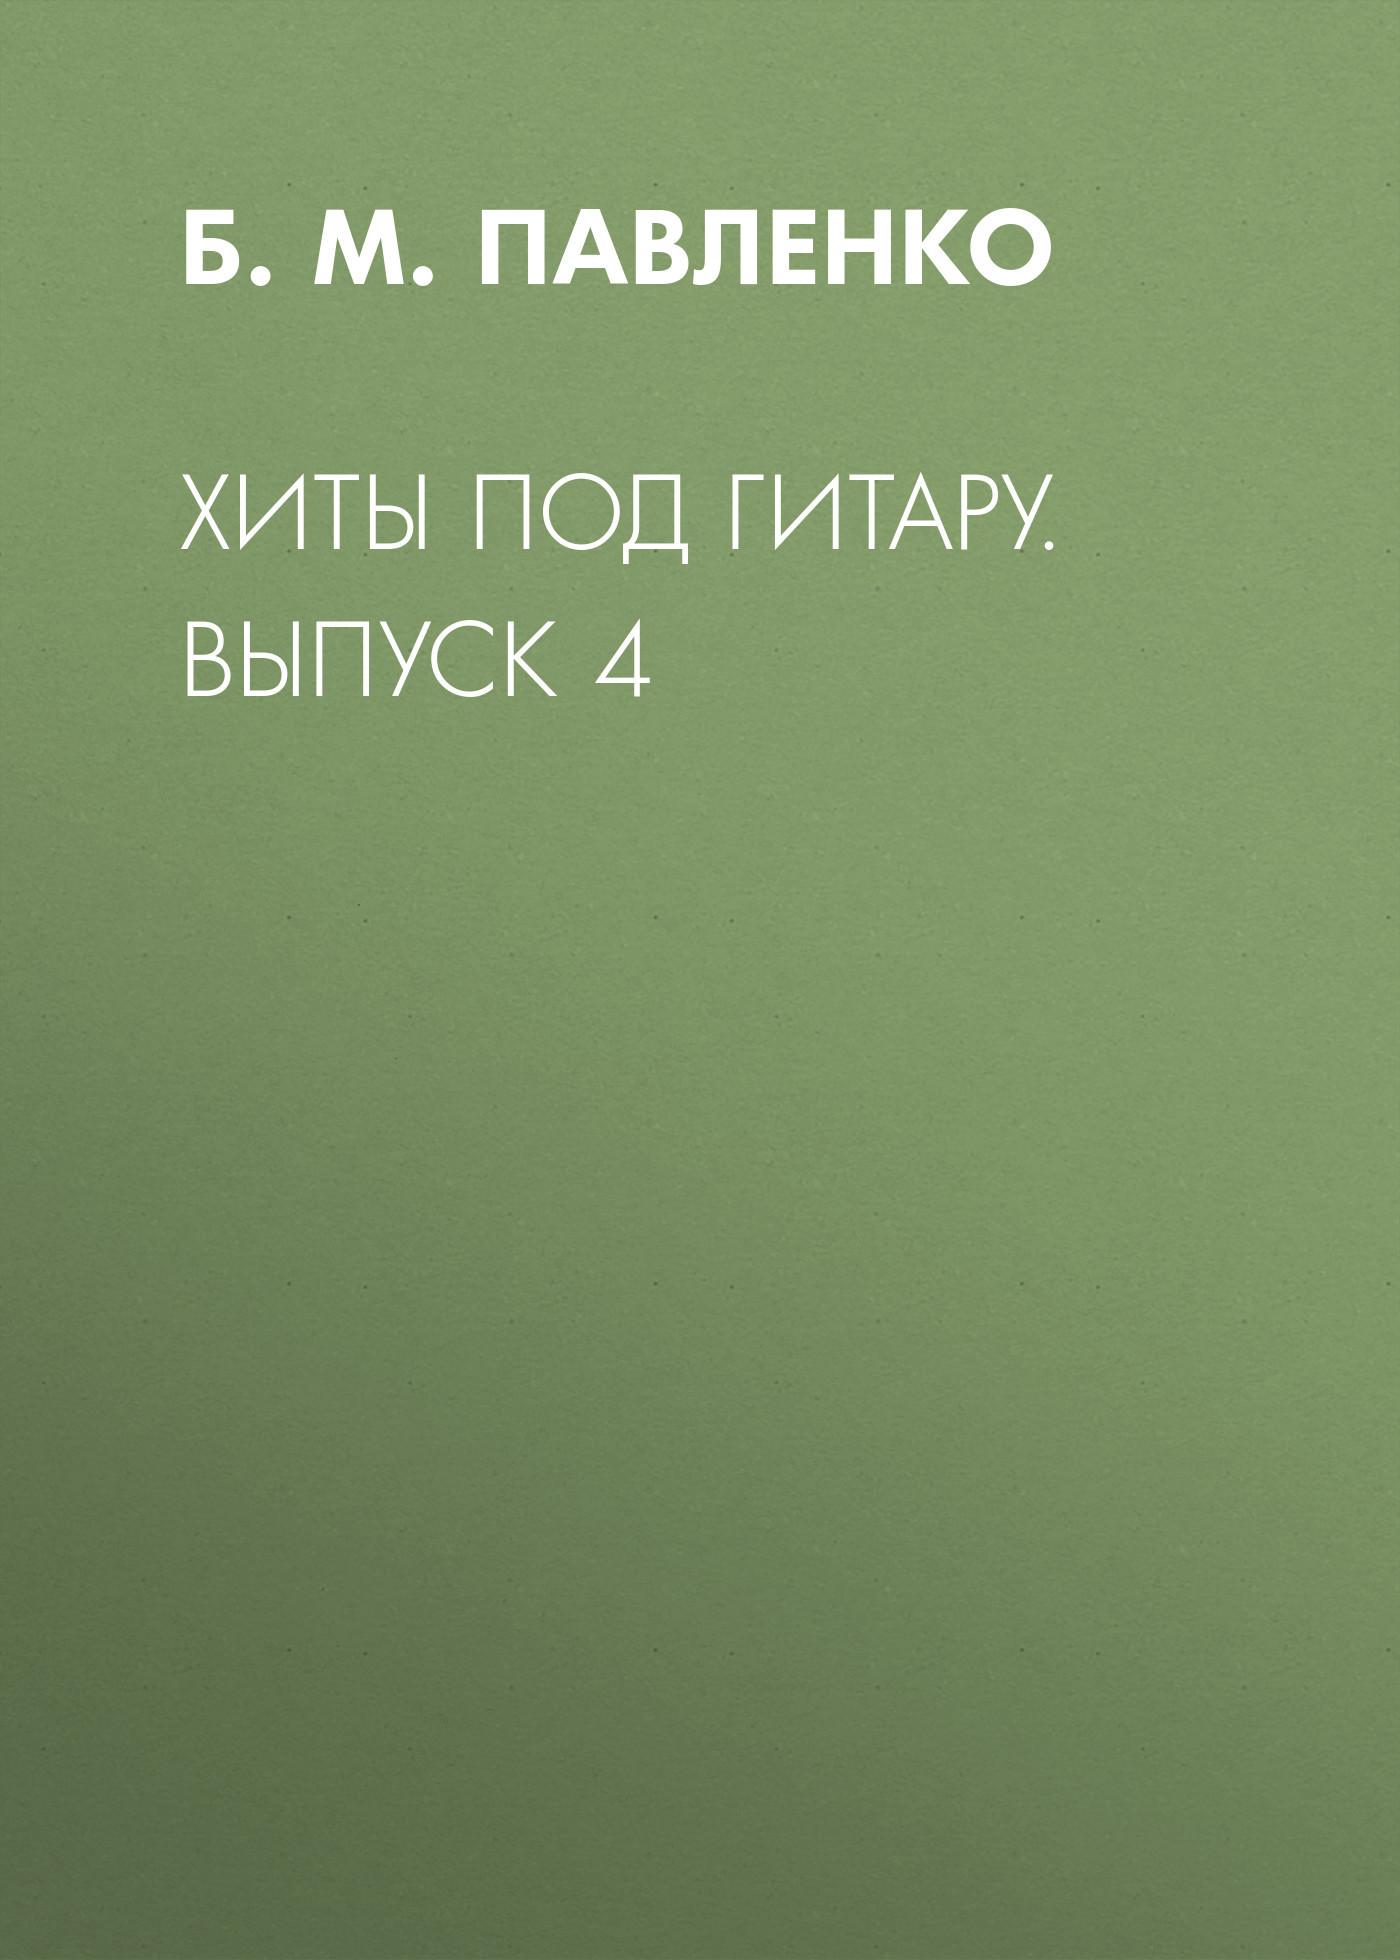 Б. М. Павленко Хиты под гитару. Выпуск 4 б м павленко хиты под гитару выпуск 1